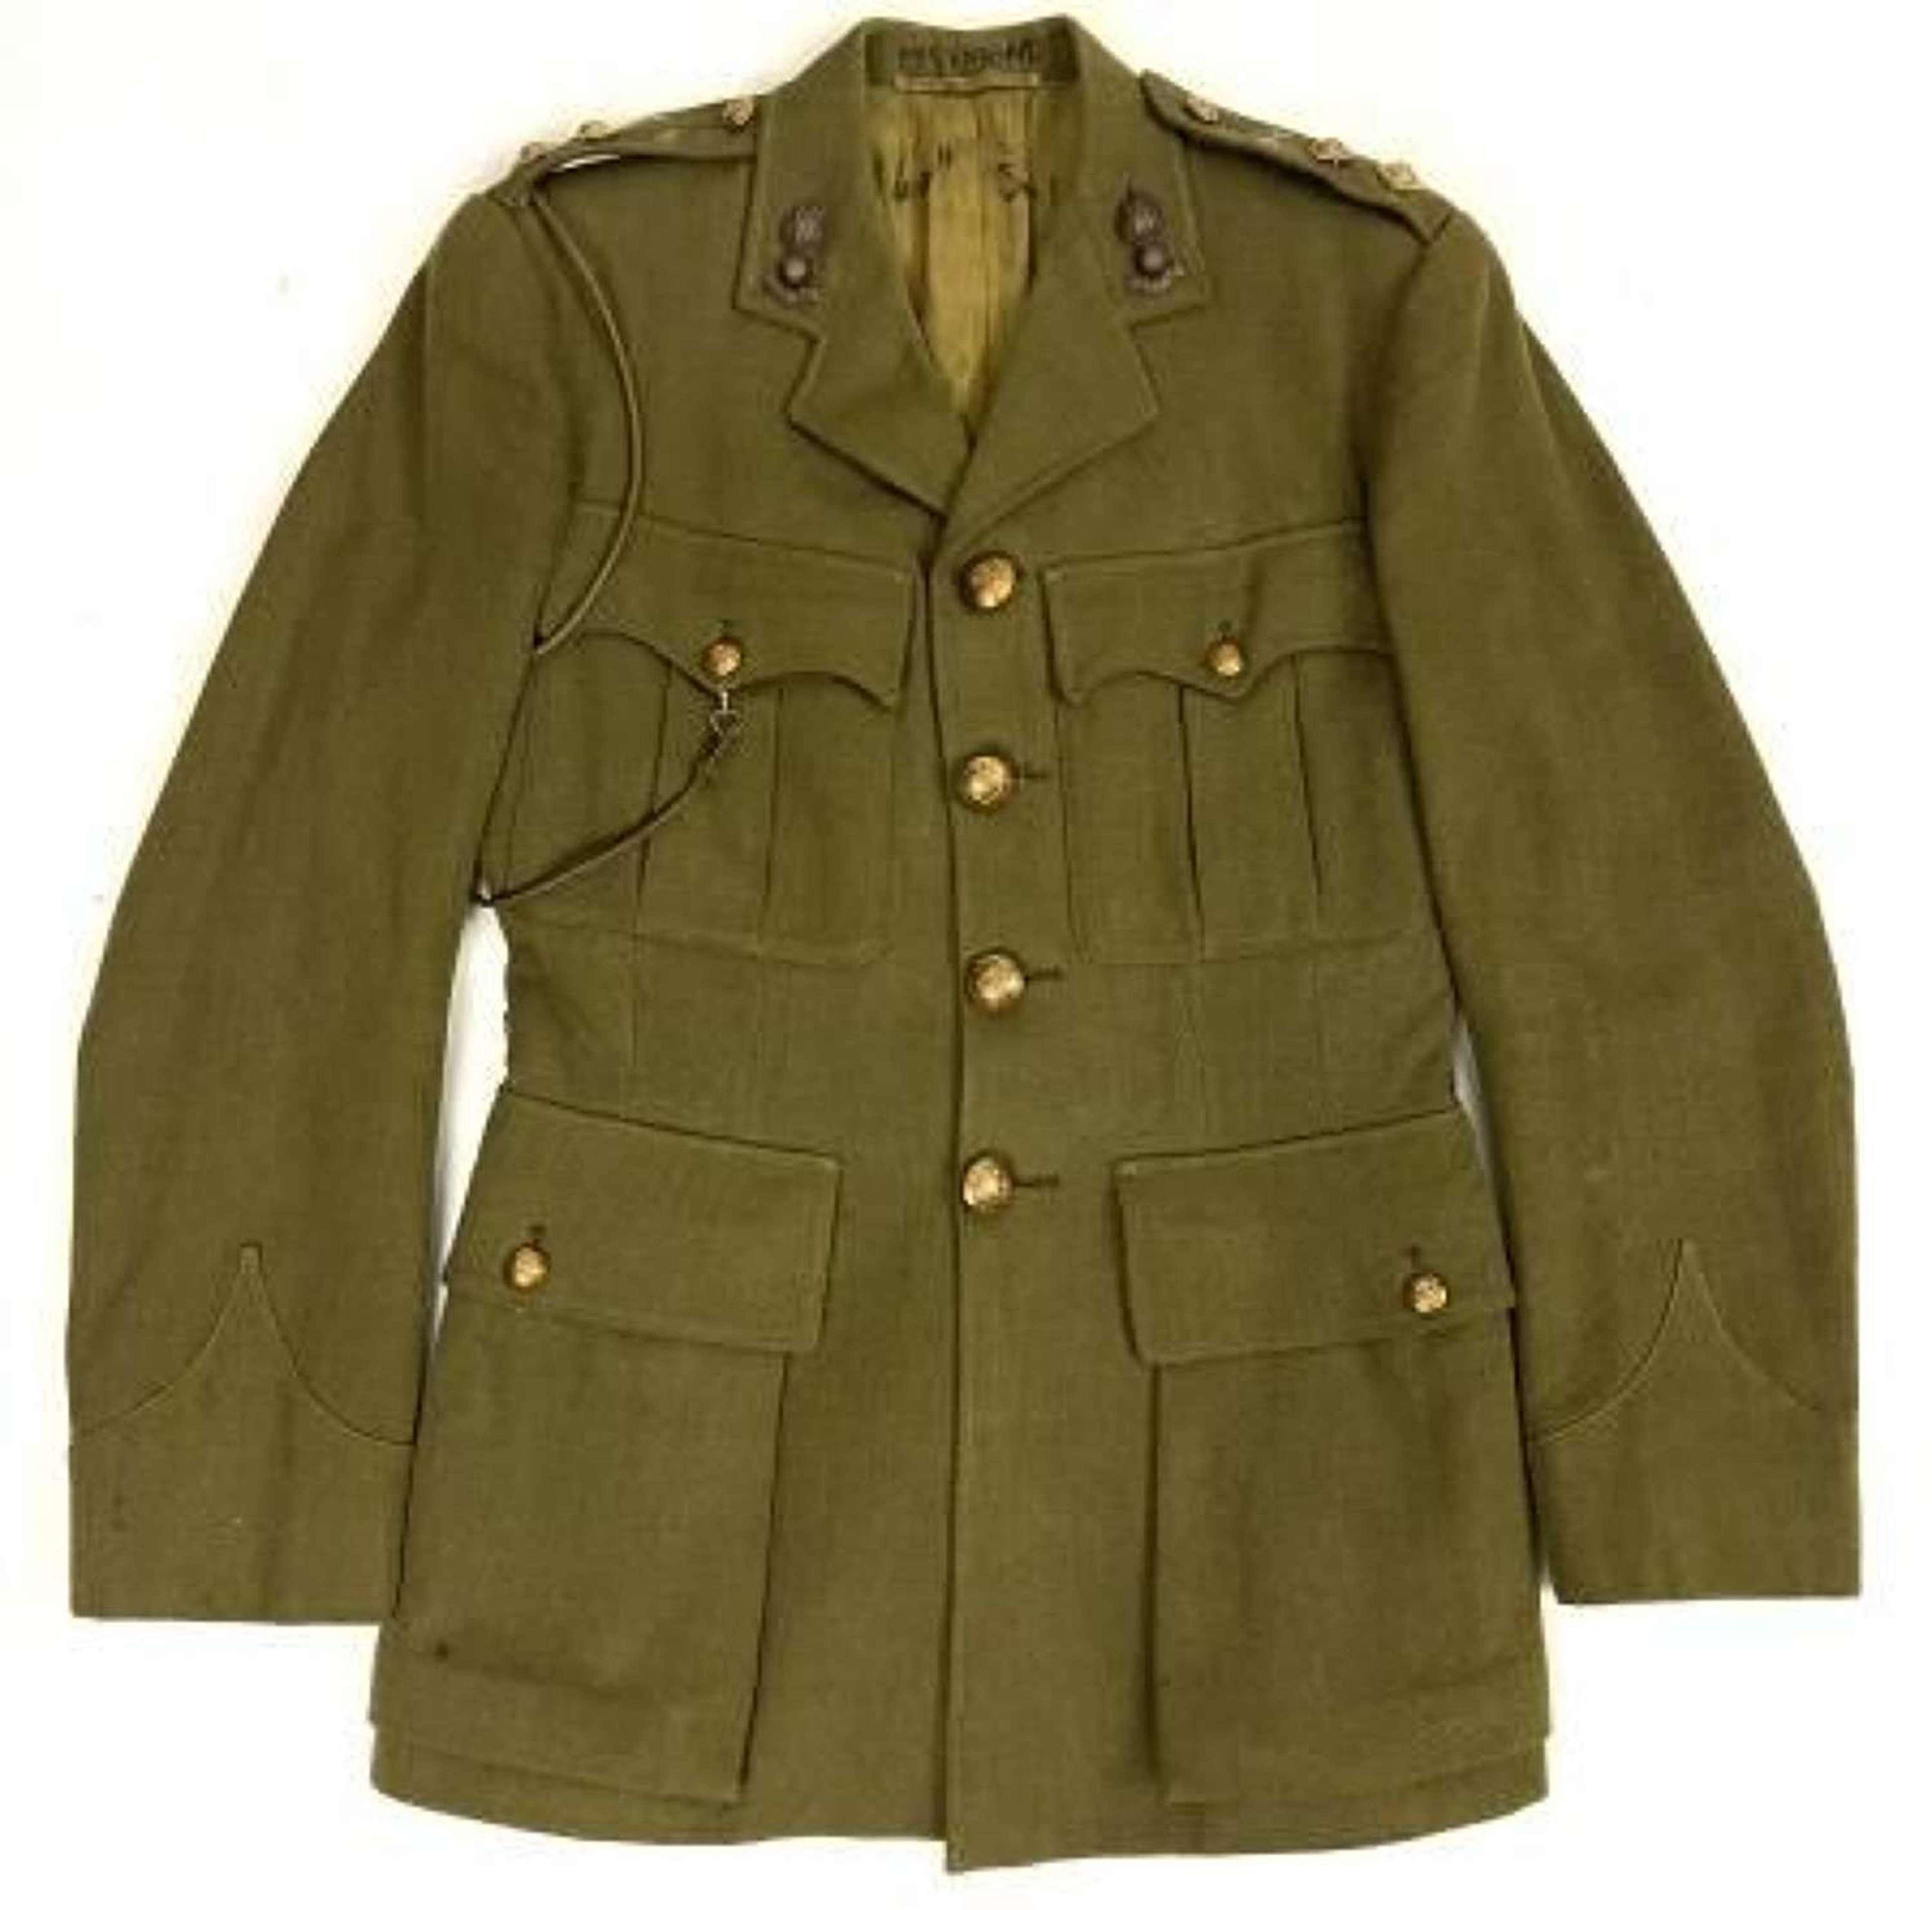 Original WW2 Royal Engineers Officers Service Dress Tunic